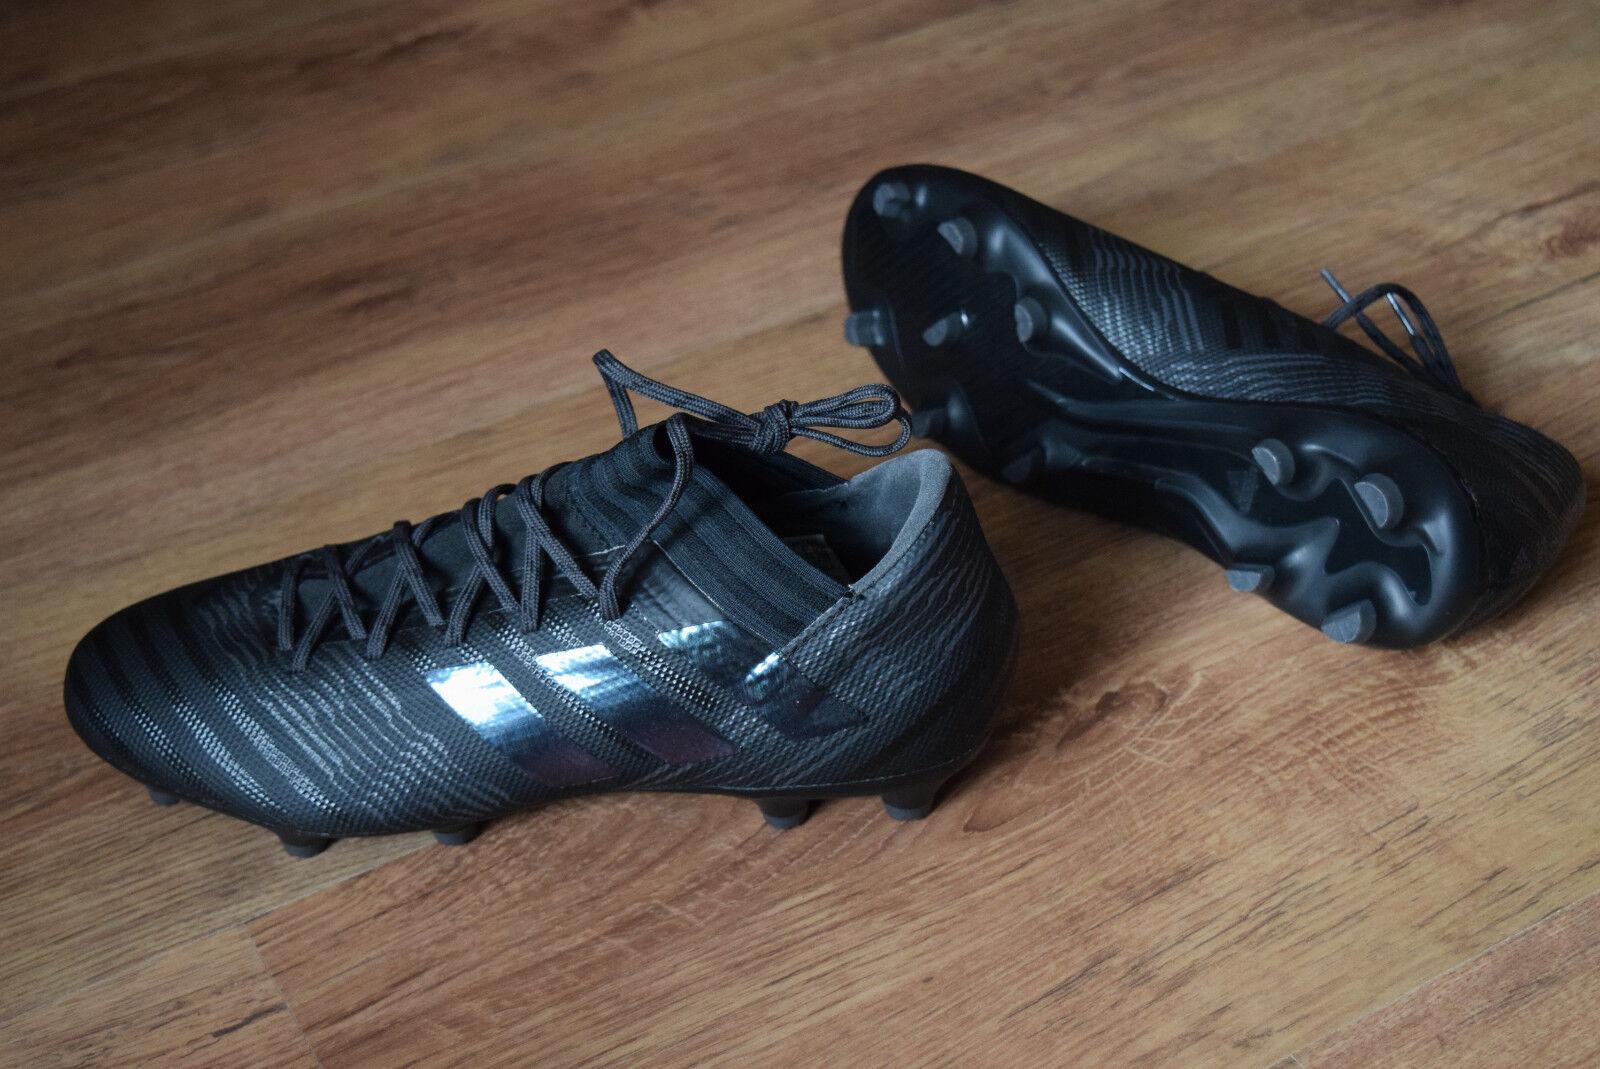 Adidas Nemeziz 17.3 Fg 40,5 42 Sautope da Calcio Tutto Nero S80600 Ace 17.3